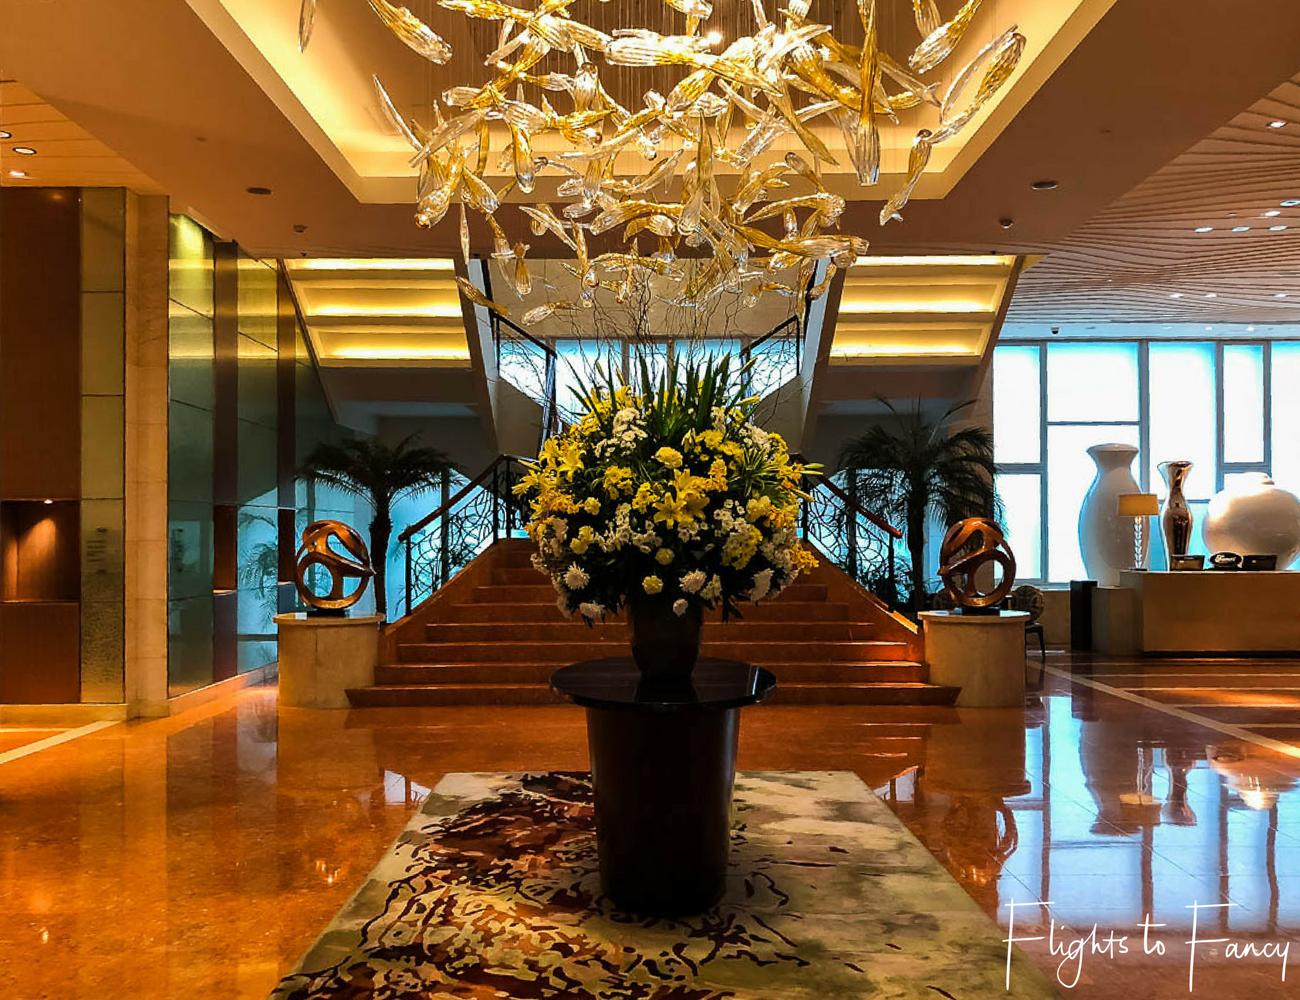 Flights to Fancy - Fairmont Makati Lobby